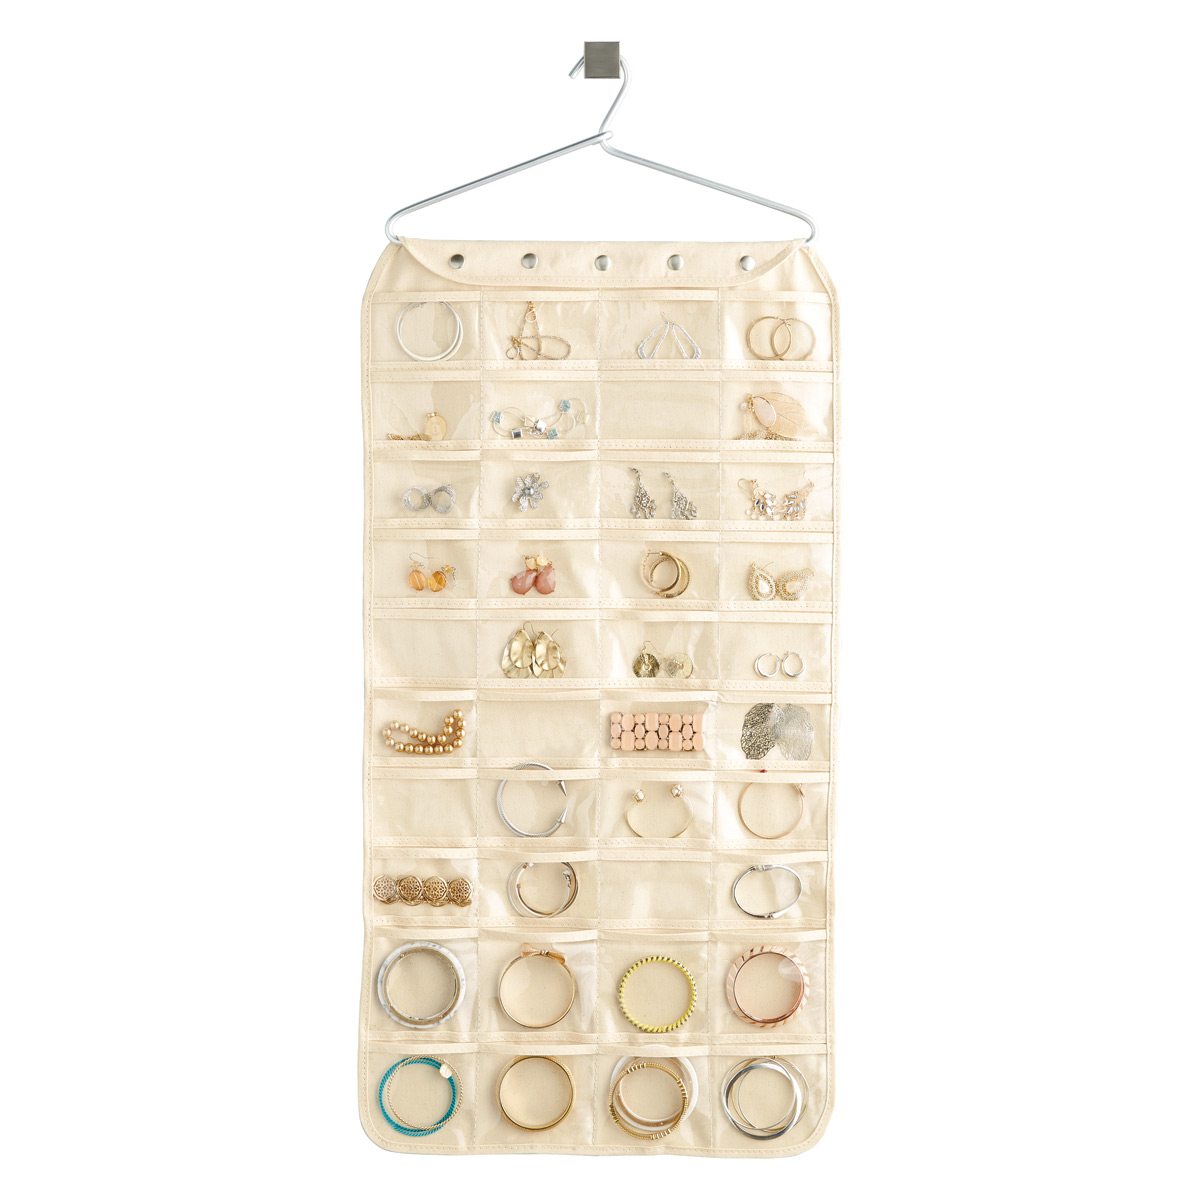 80-Pocket Canvas Hanging Jewelry Organizer  sc 1 st  The Container Store & Hanging Jewelry Holder - 80-Pocket Canvas Hanging Jewelry Organizer ...